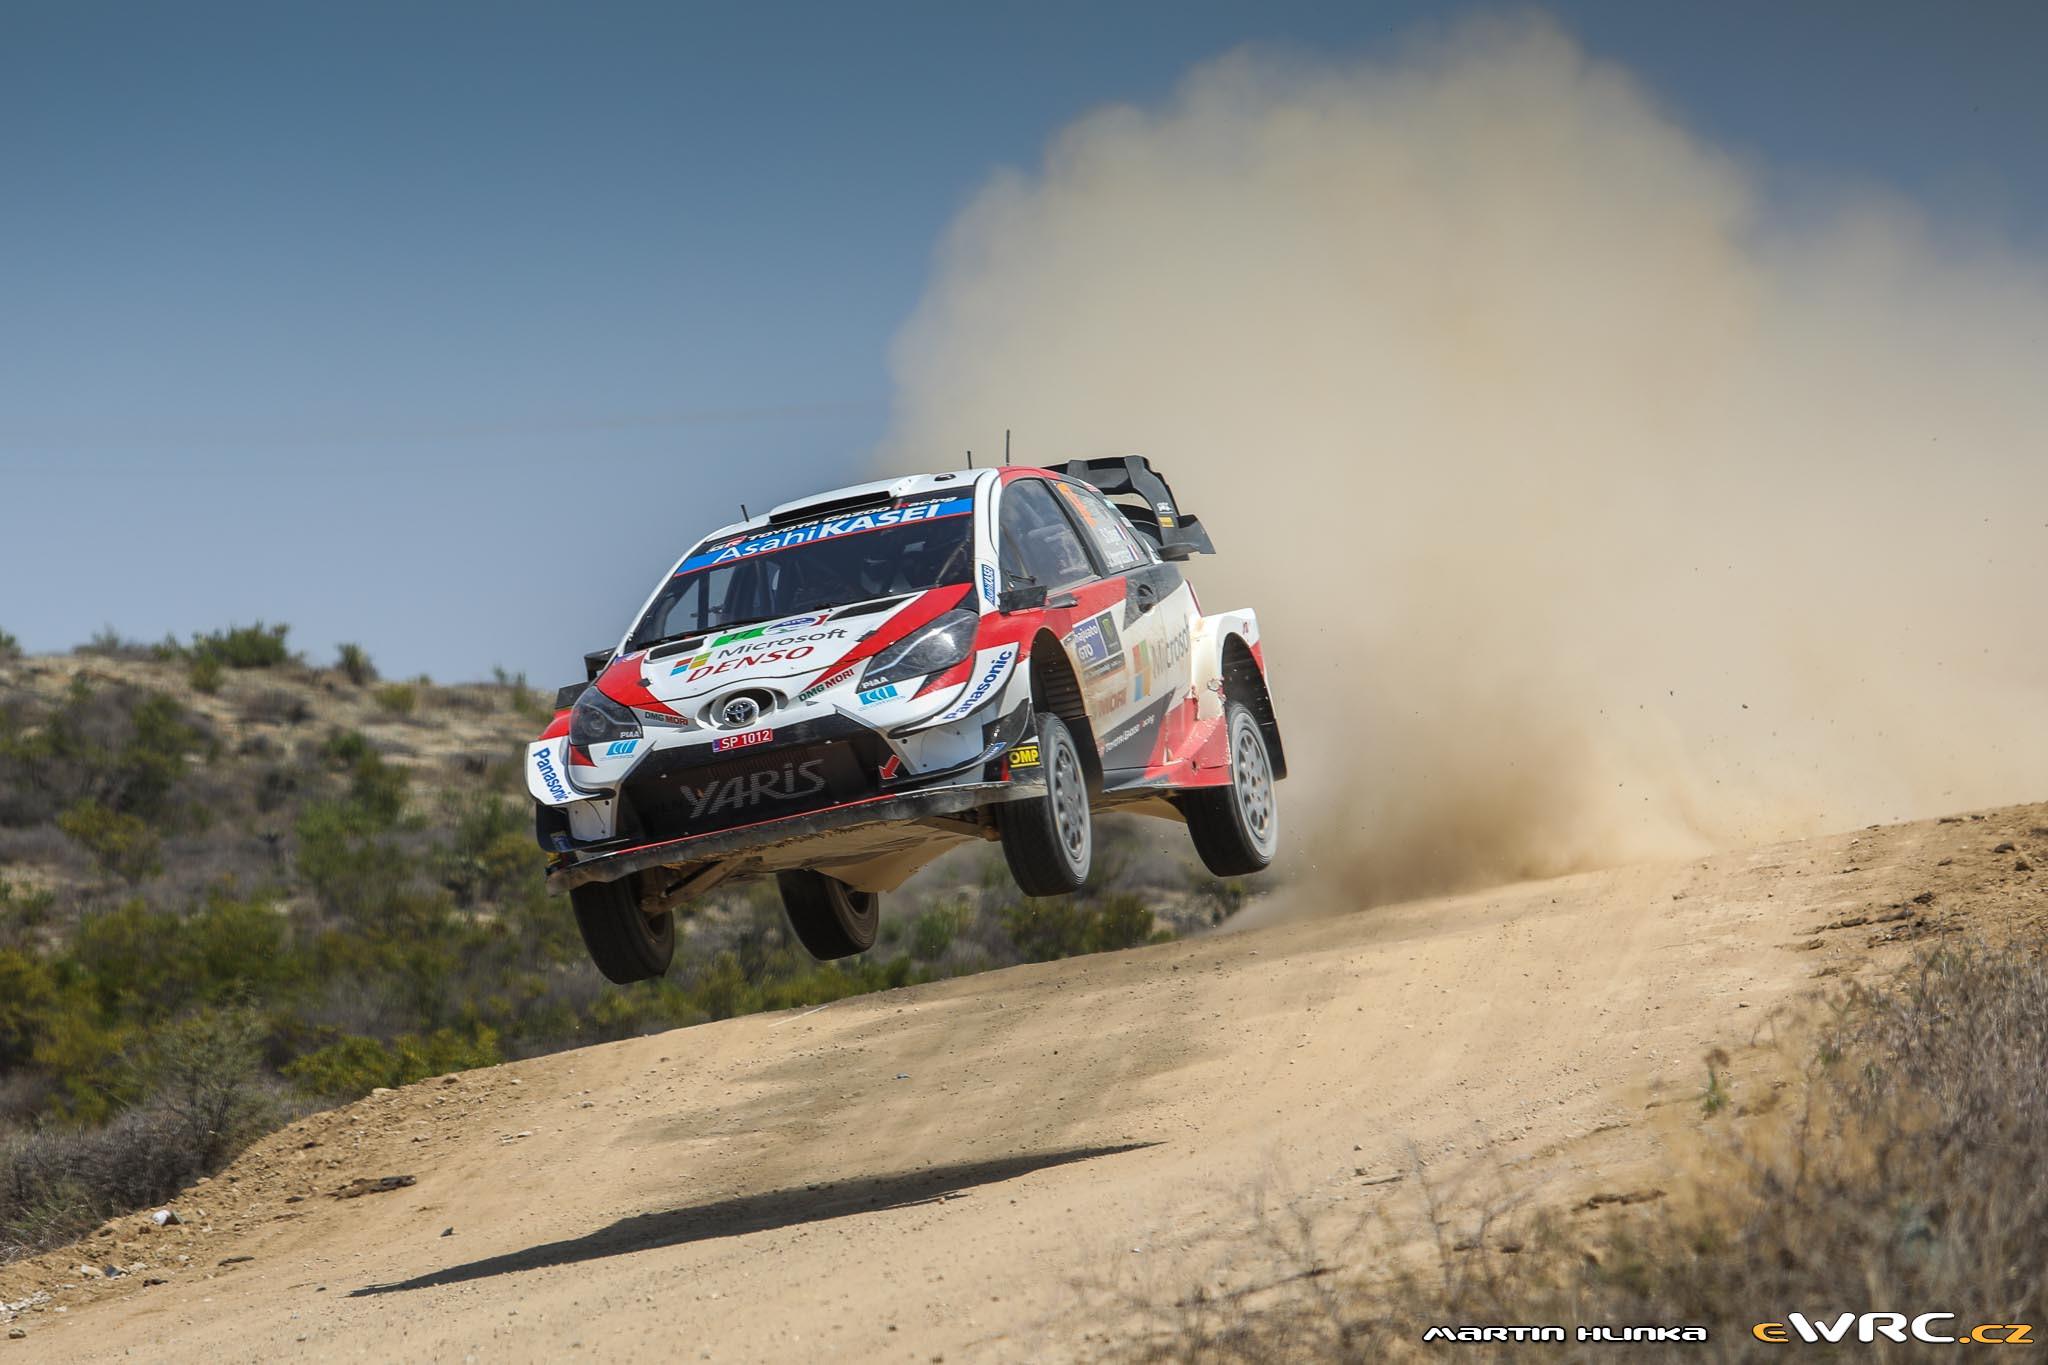 WRC: 17º Rallye Guanajuato Corona - México [12-15 Marzo] - Página 5 Mhl_9b2a0861